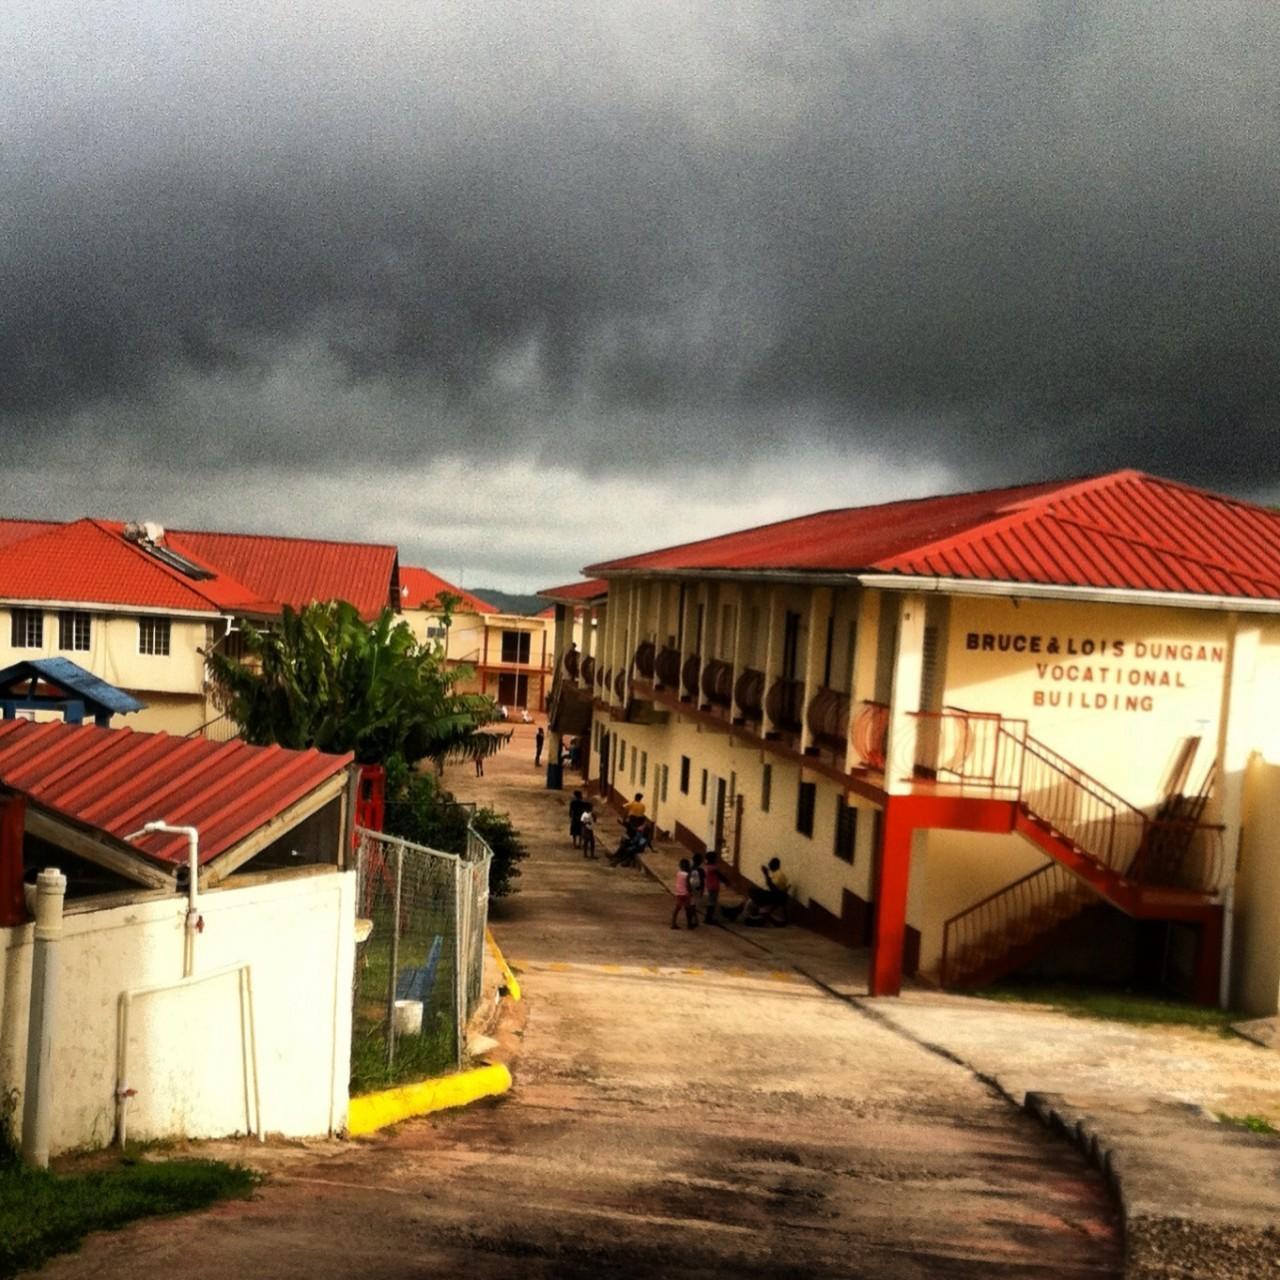 The Caribbean Christian Centre for the Deaf